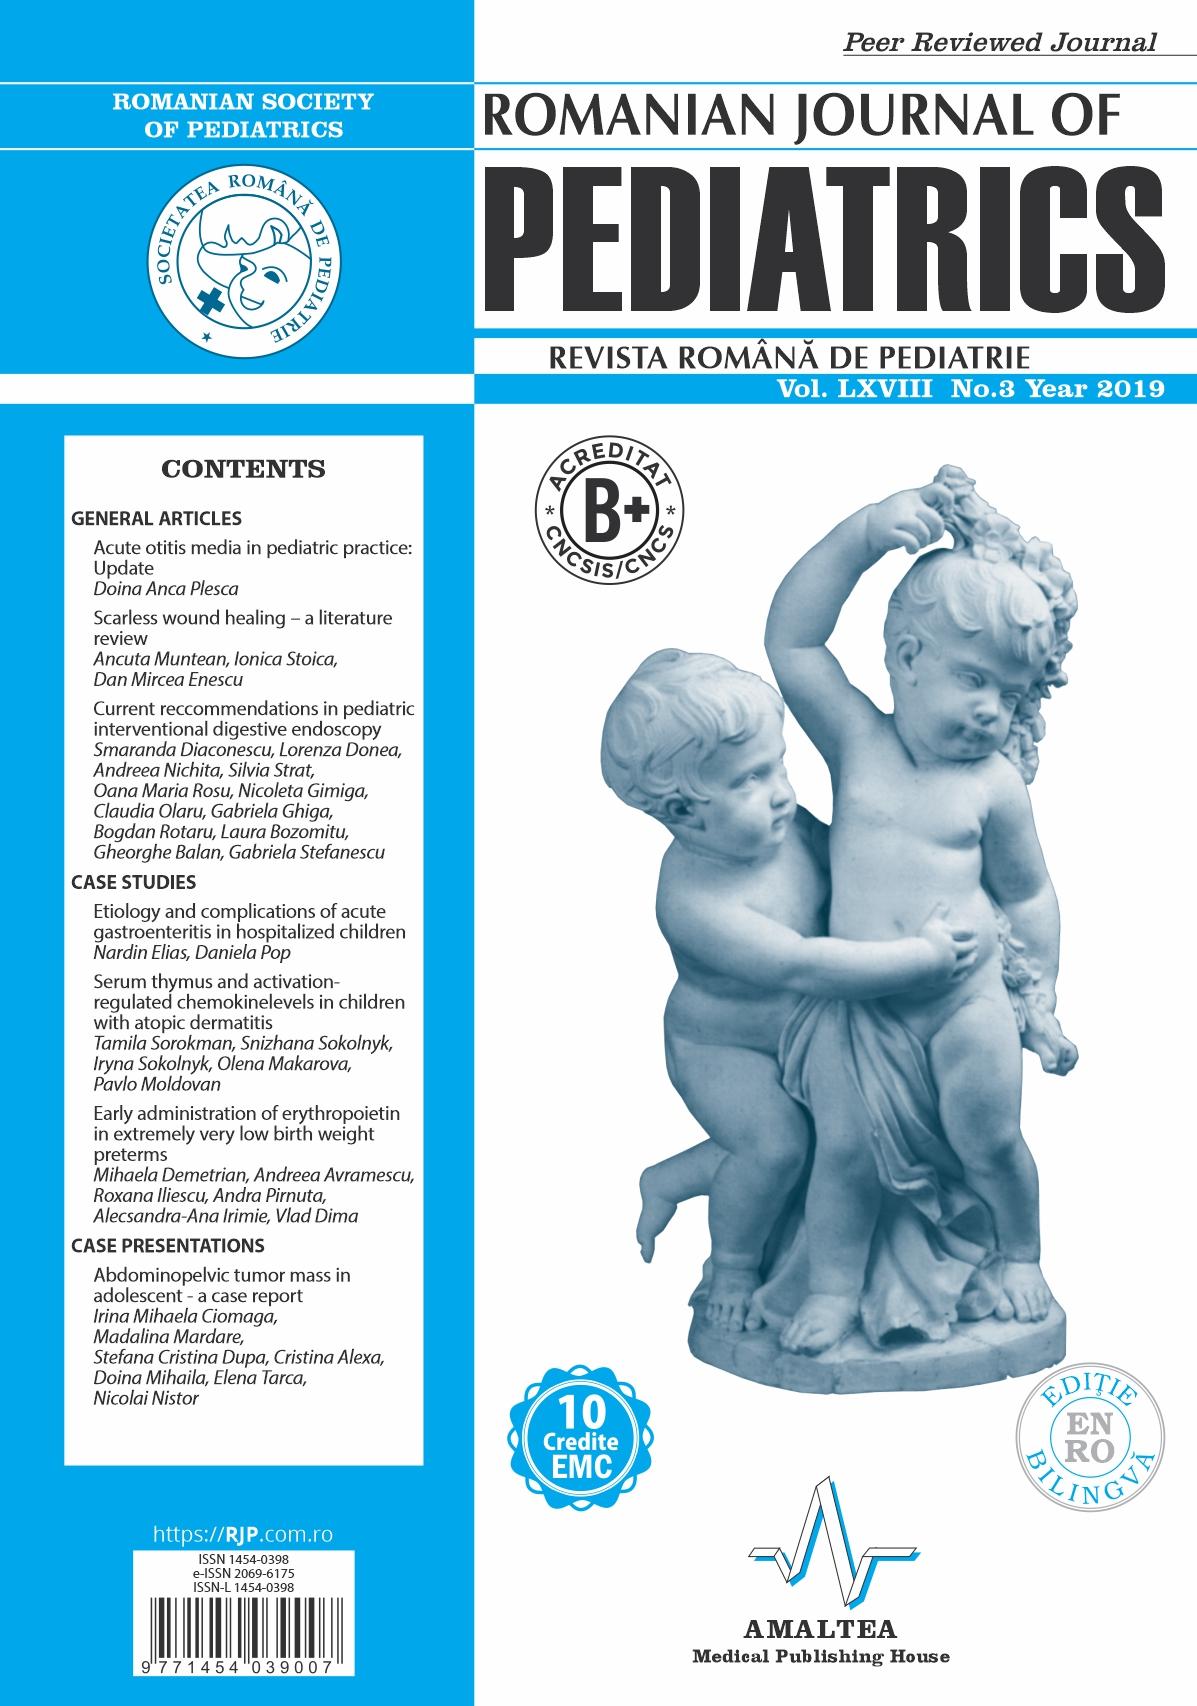 Romanian Journal of Pediatrics | Volume LXVIII, No. 3, Year 2019